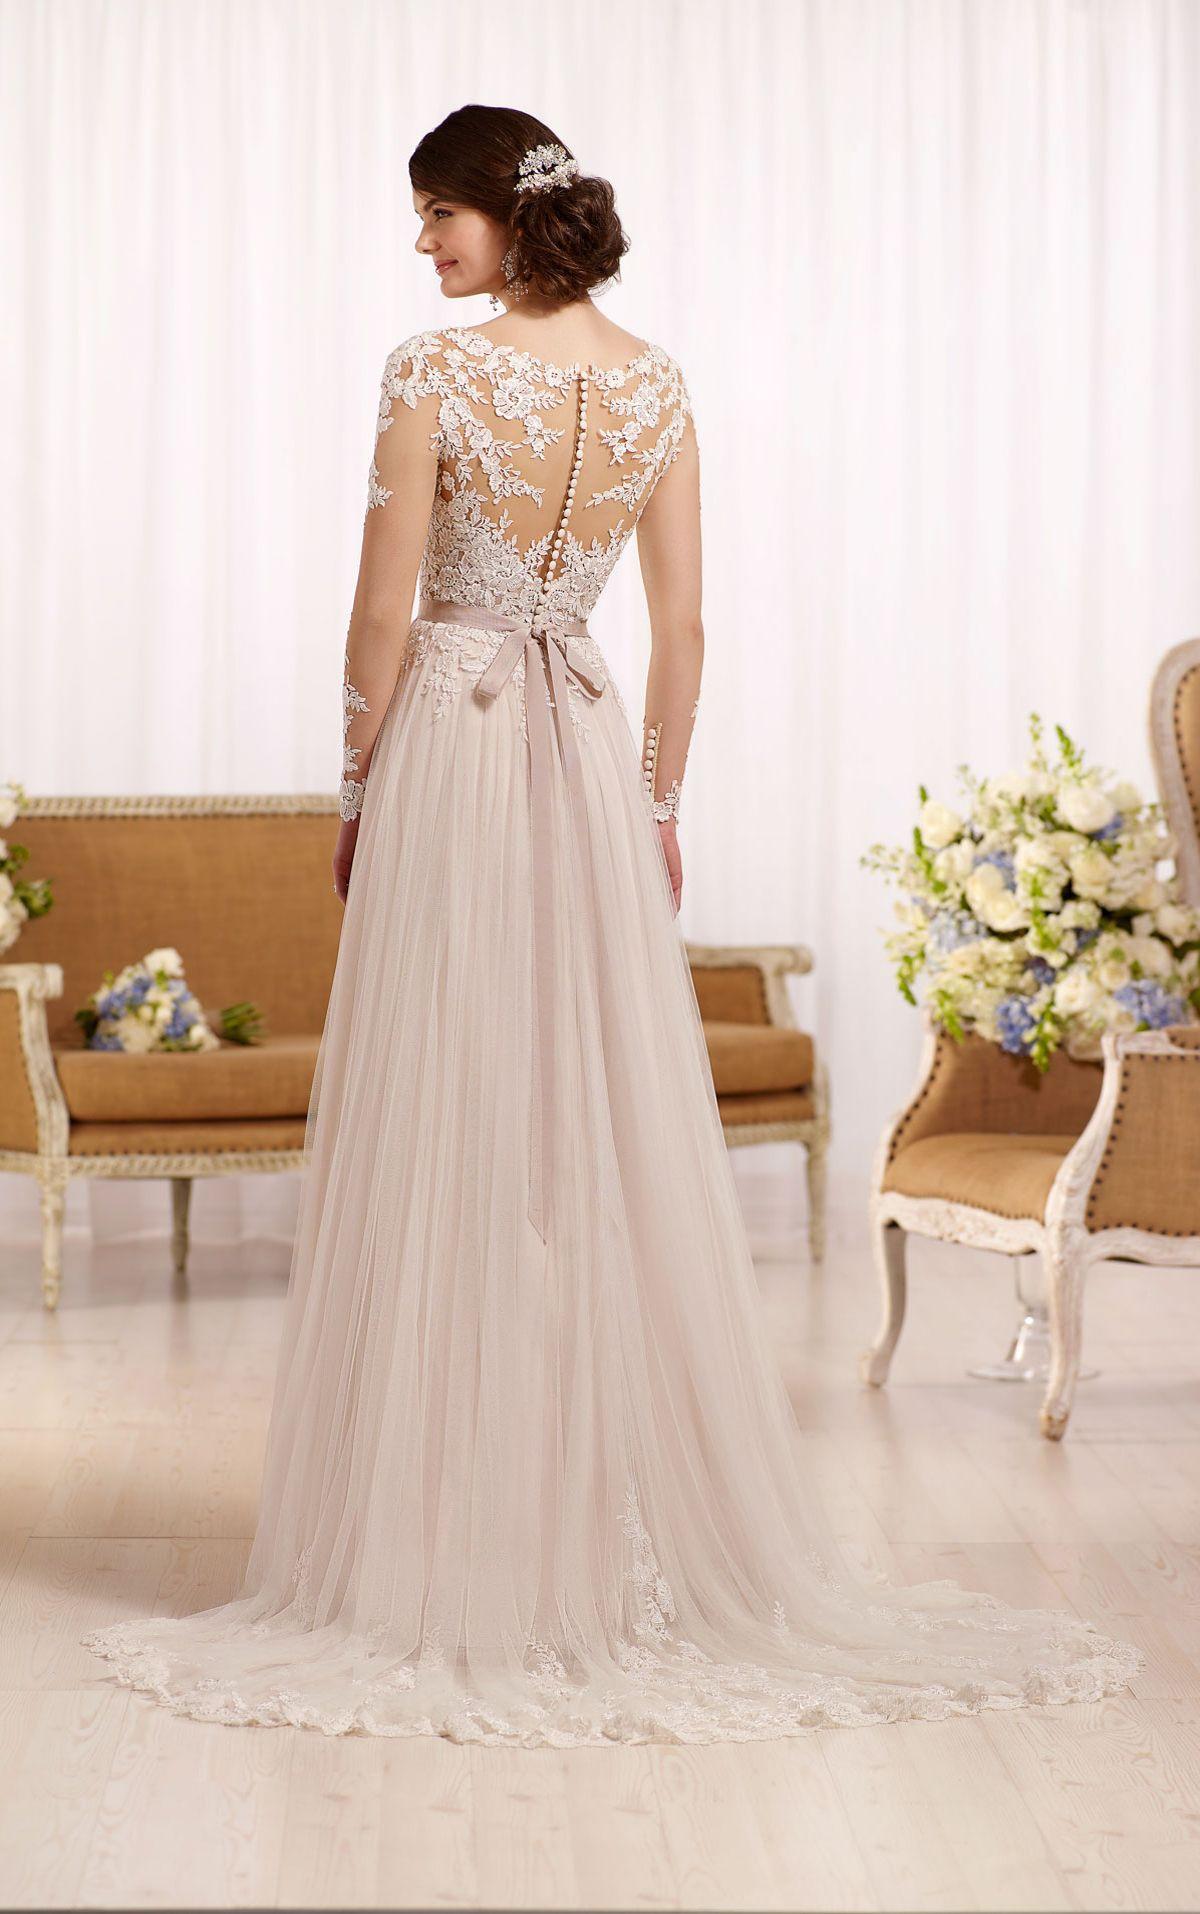 33++ Tulle skirt under wedding dress information